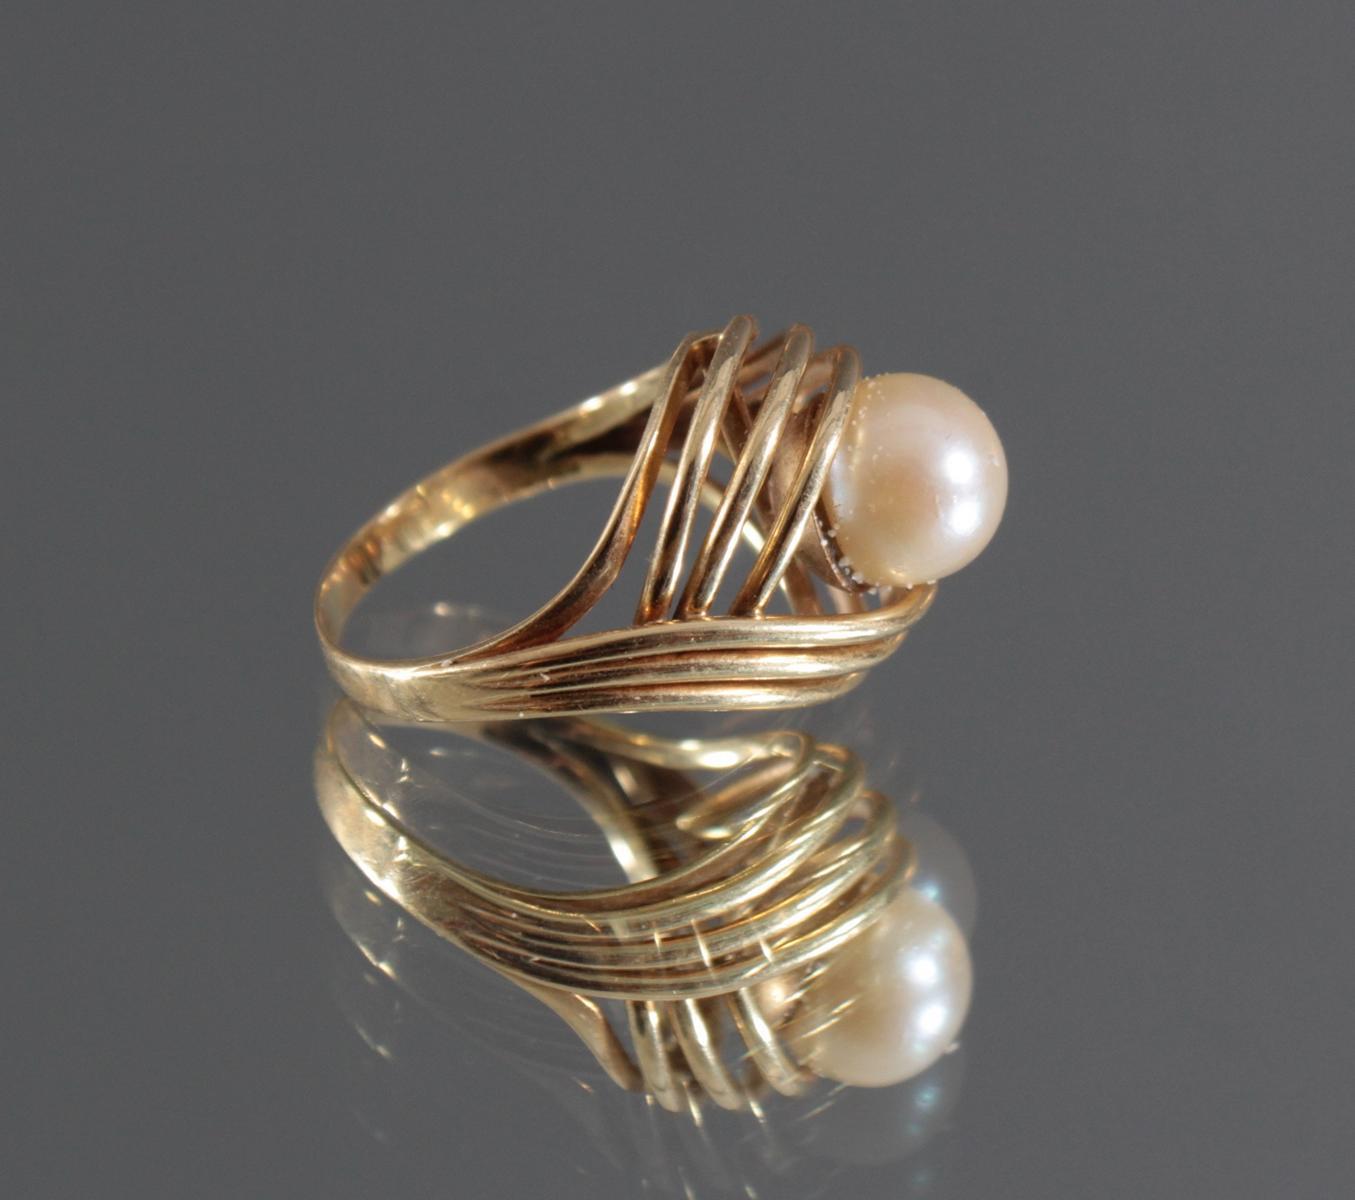 Damenring mit Perle, 14 Karat Gelbgold-2